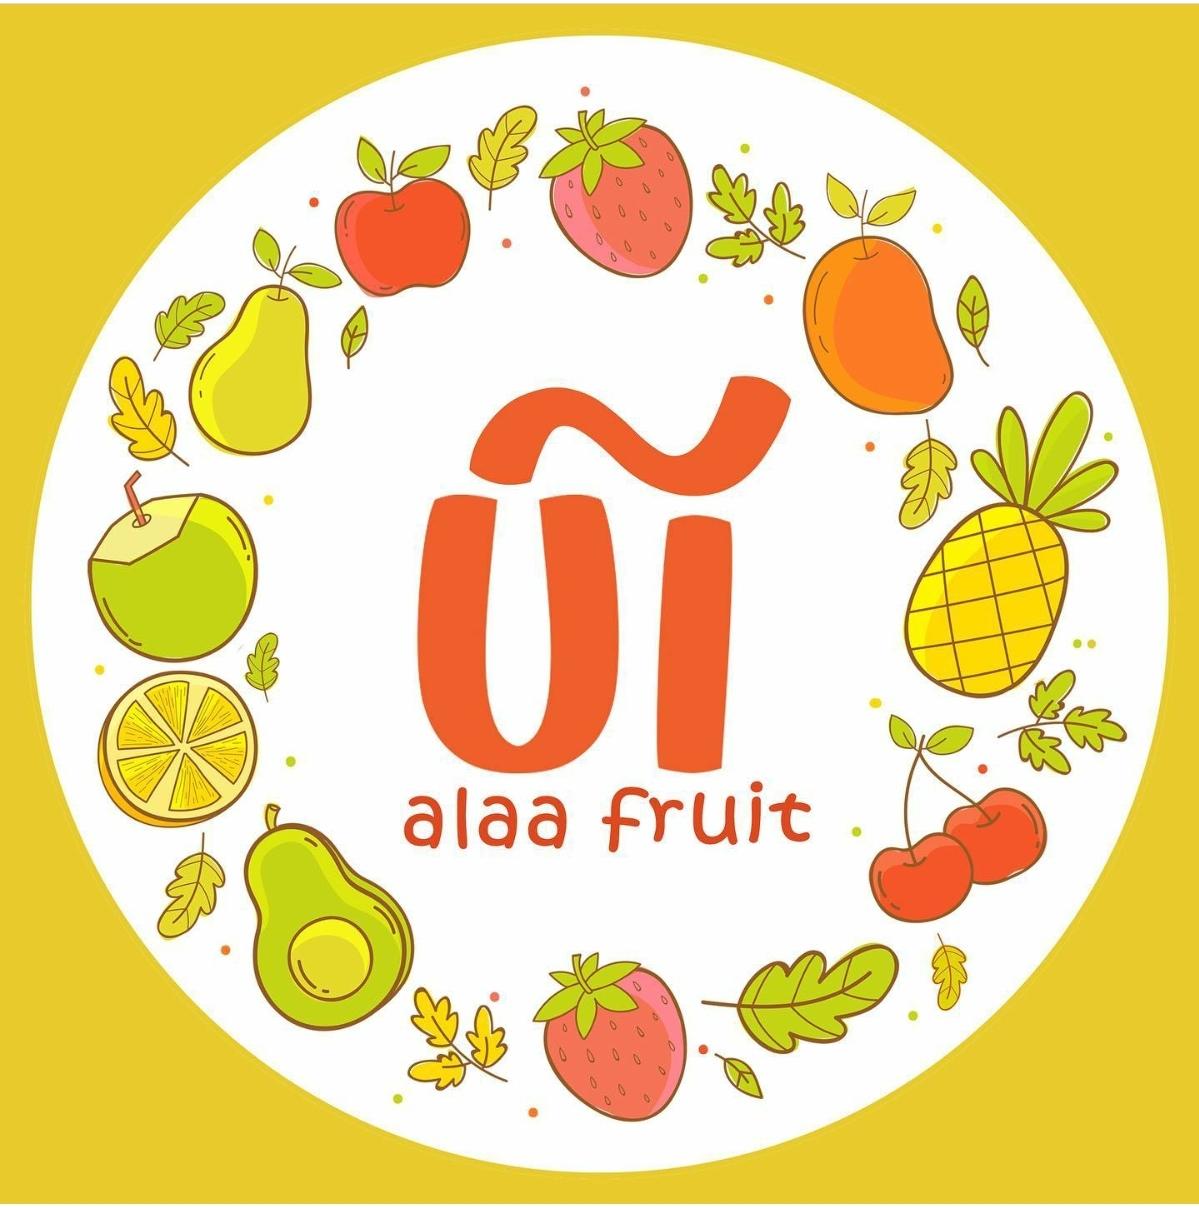 میوه خشک آلا